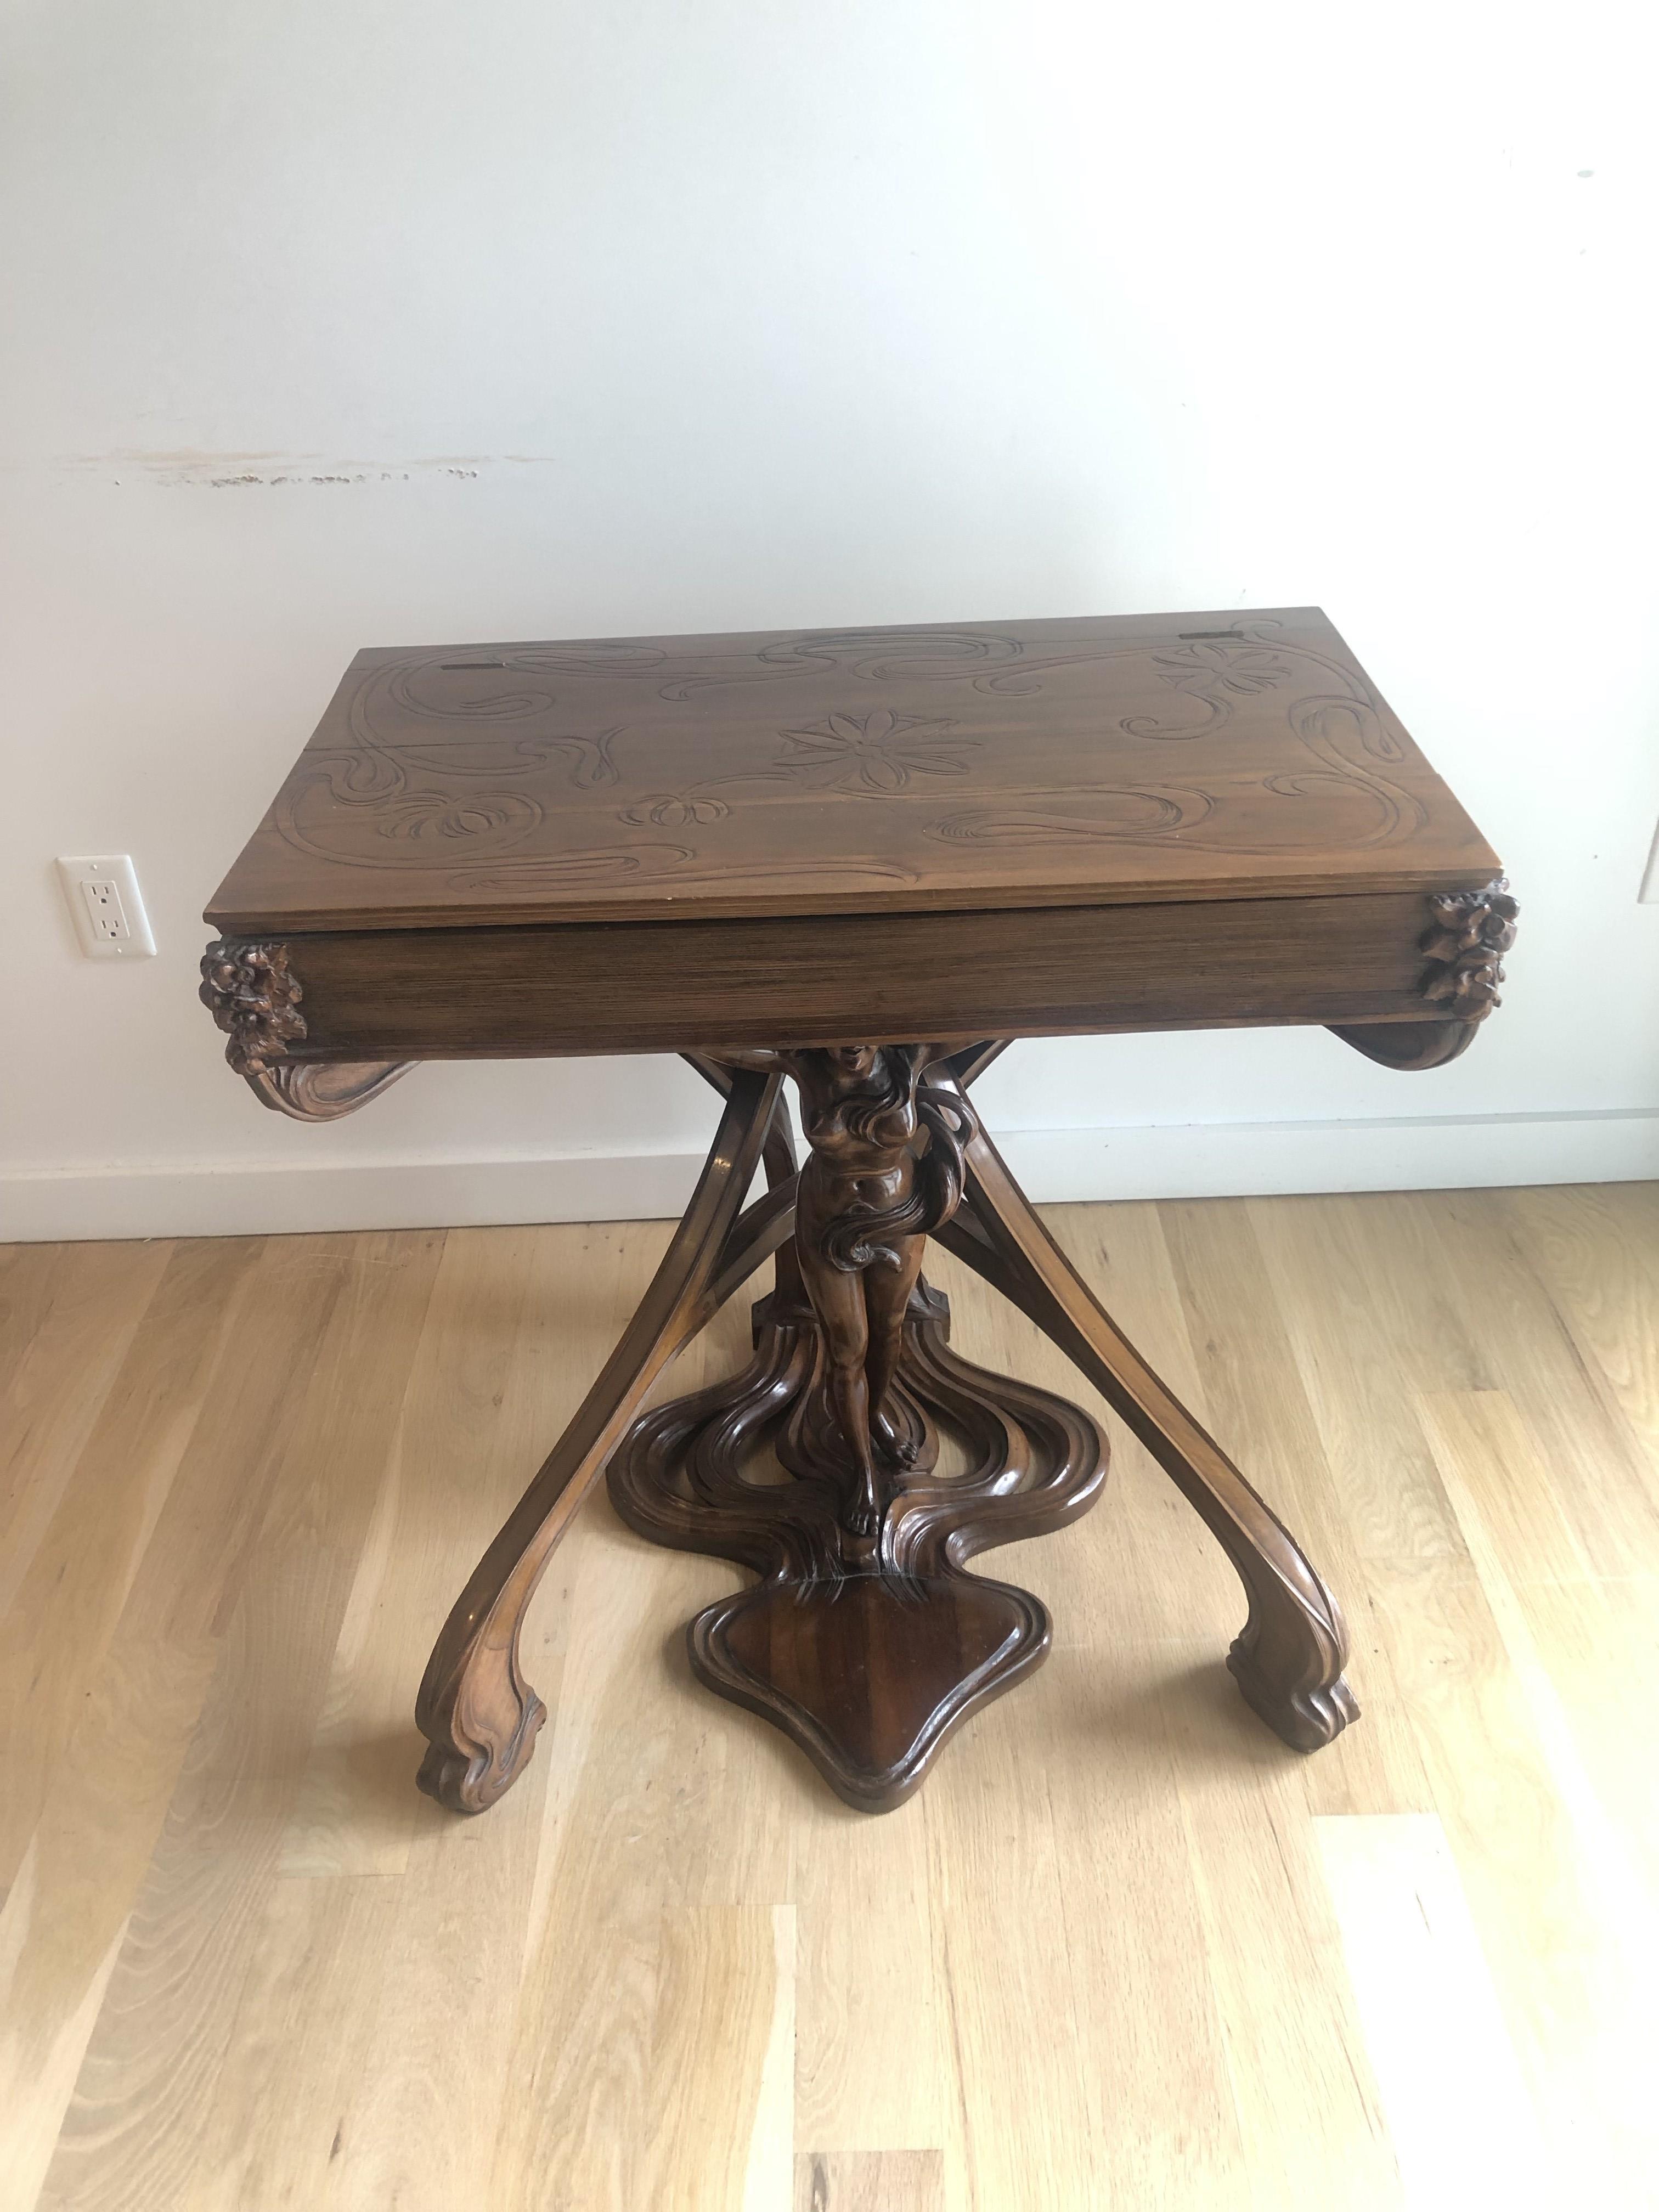 R. Carabin 1880 - 1890 French Art Nouveau Hand Made Desk